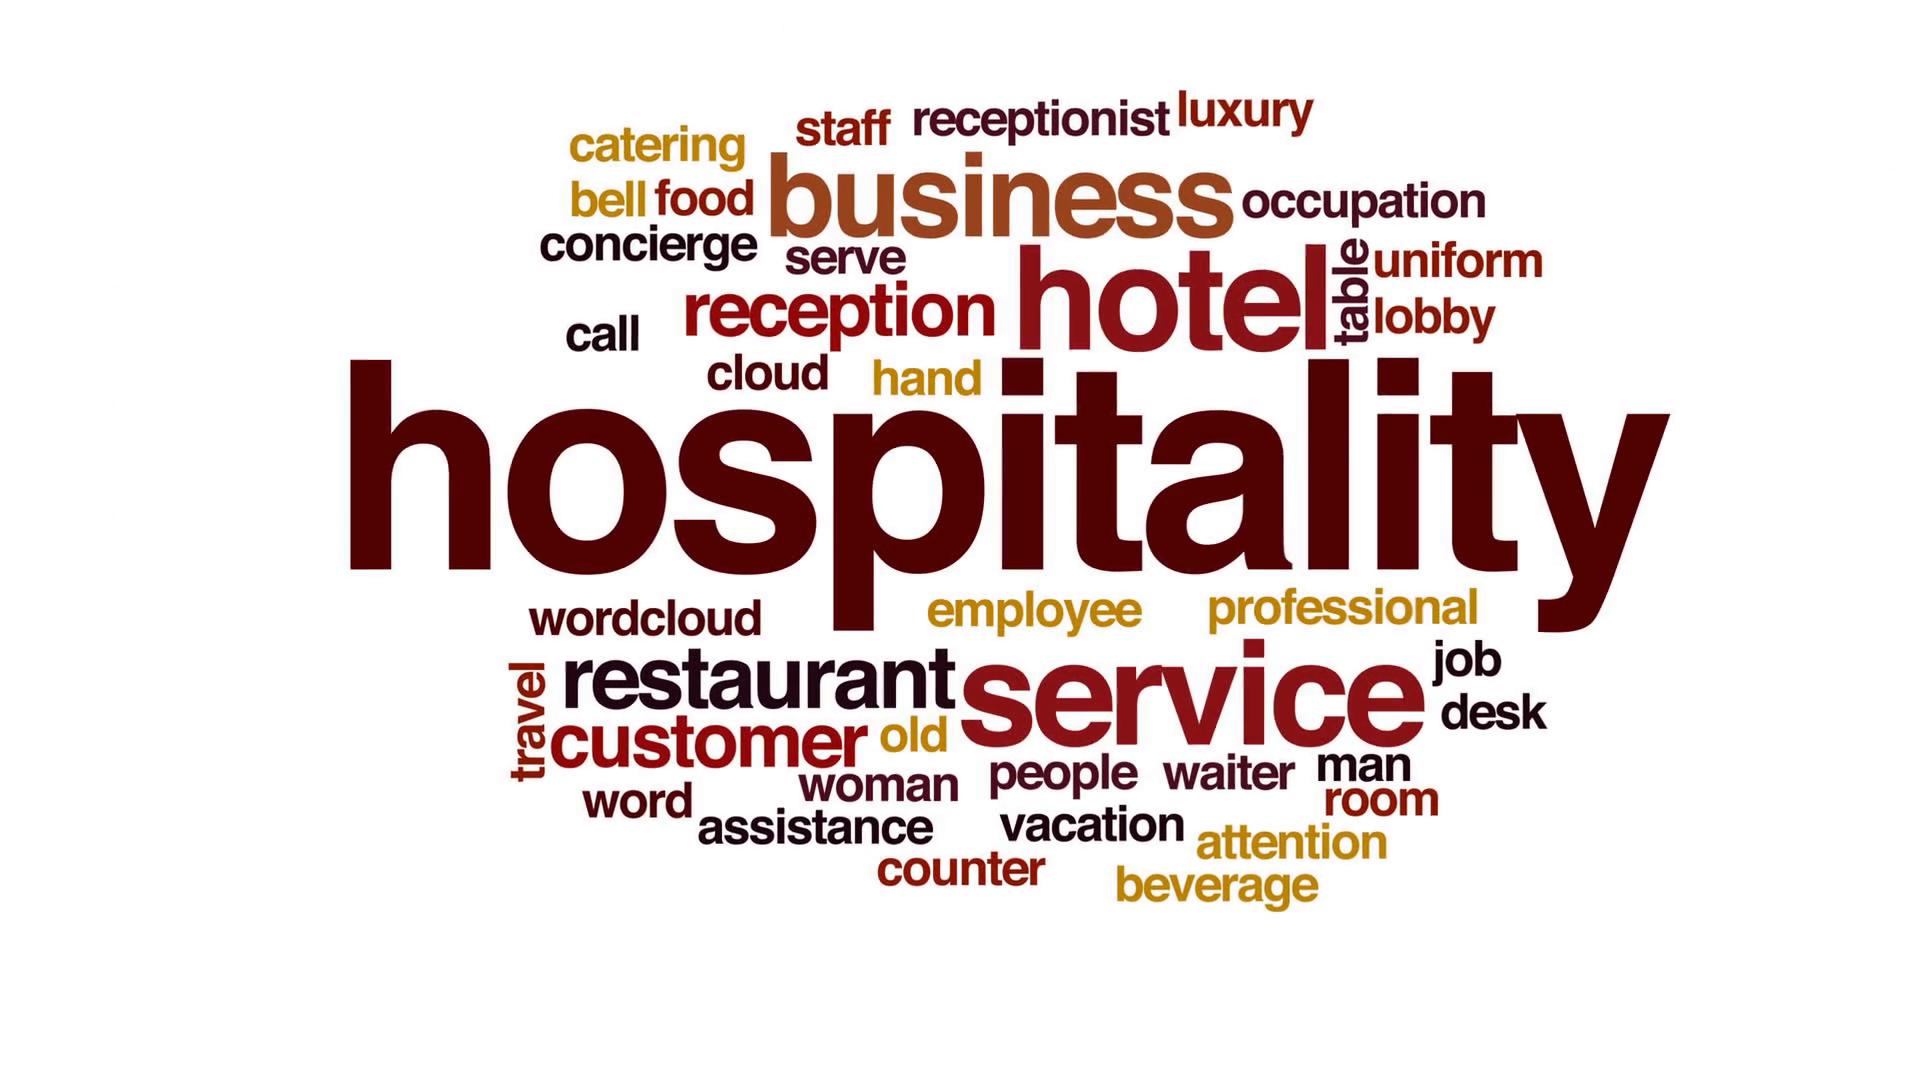 hospitality-industry